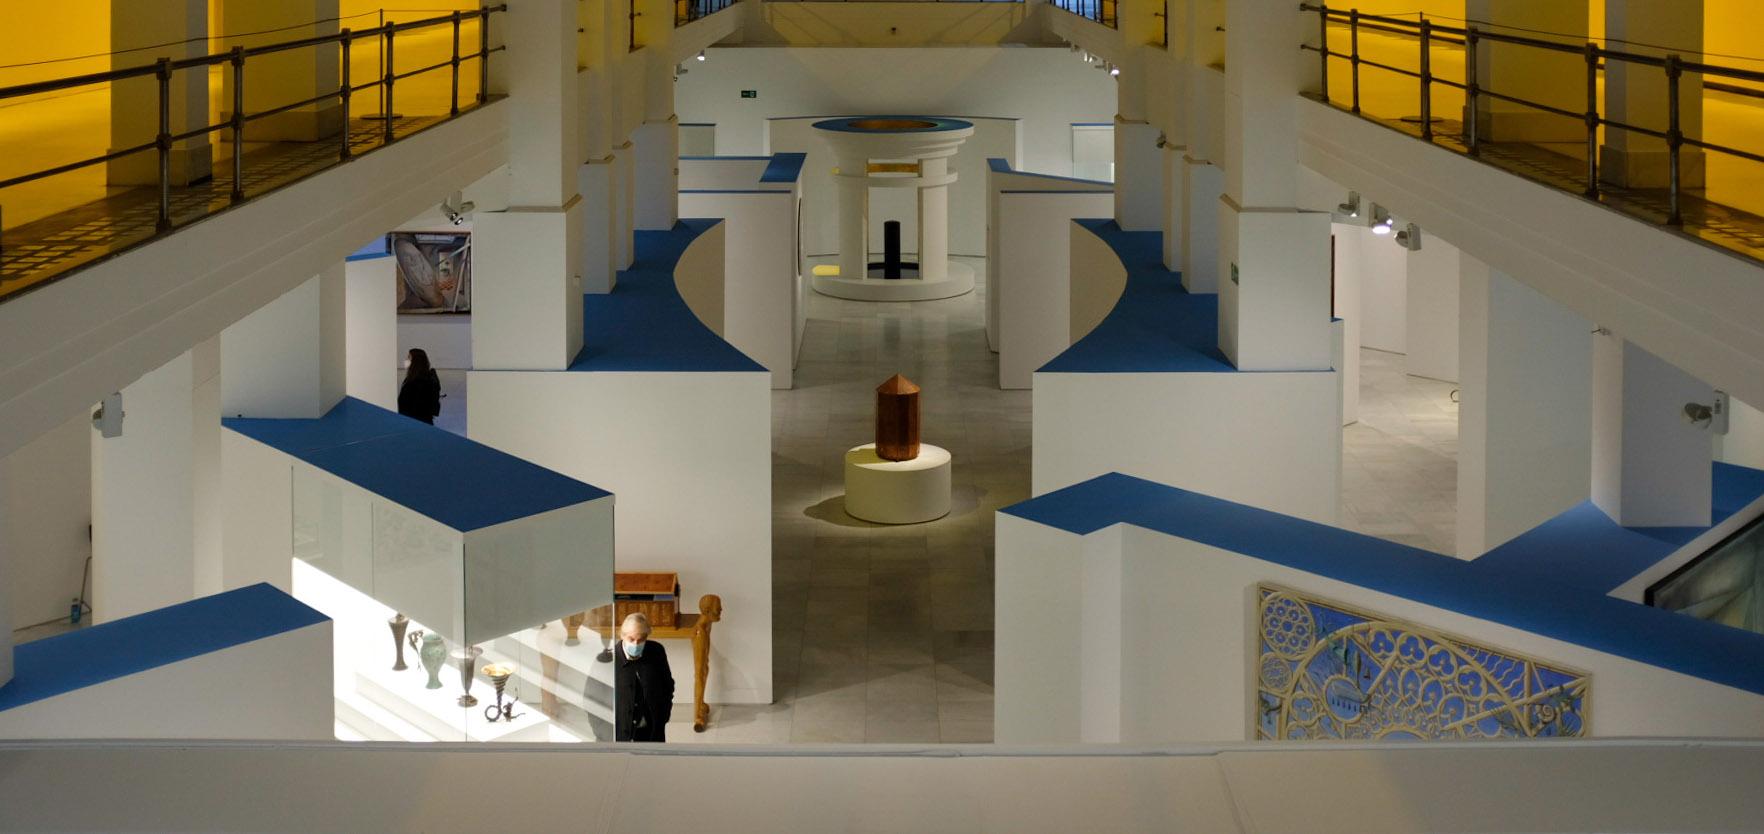 Exposición 'Guillermo Pérez Villalta. El arte como laberinto'. Foto: Guillermo Gumiel.